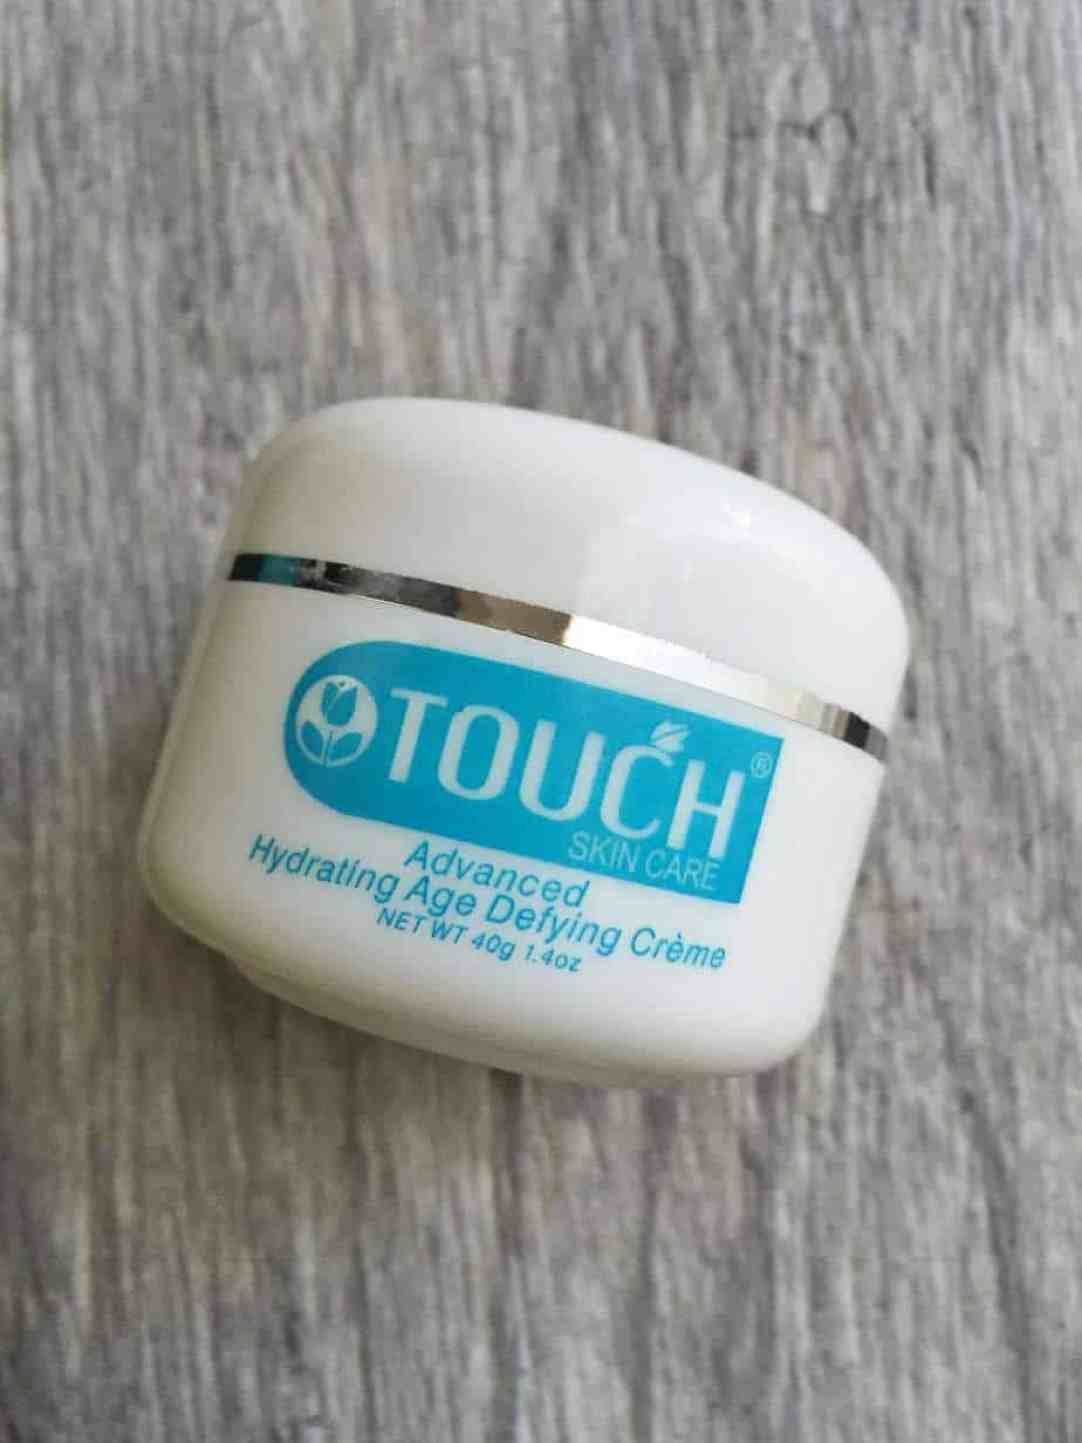 TOUCH Anti-aging Facial Moisturizer #touchantiagingfacialmoisturizer